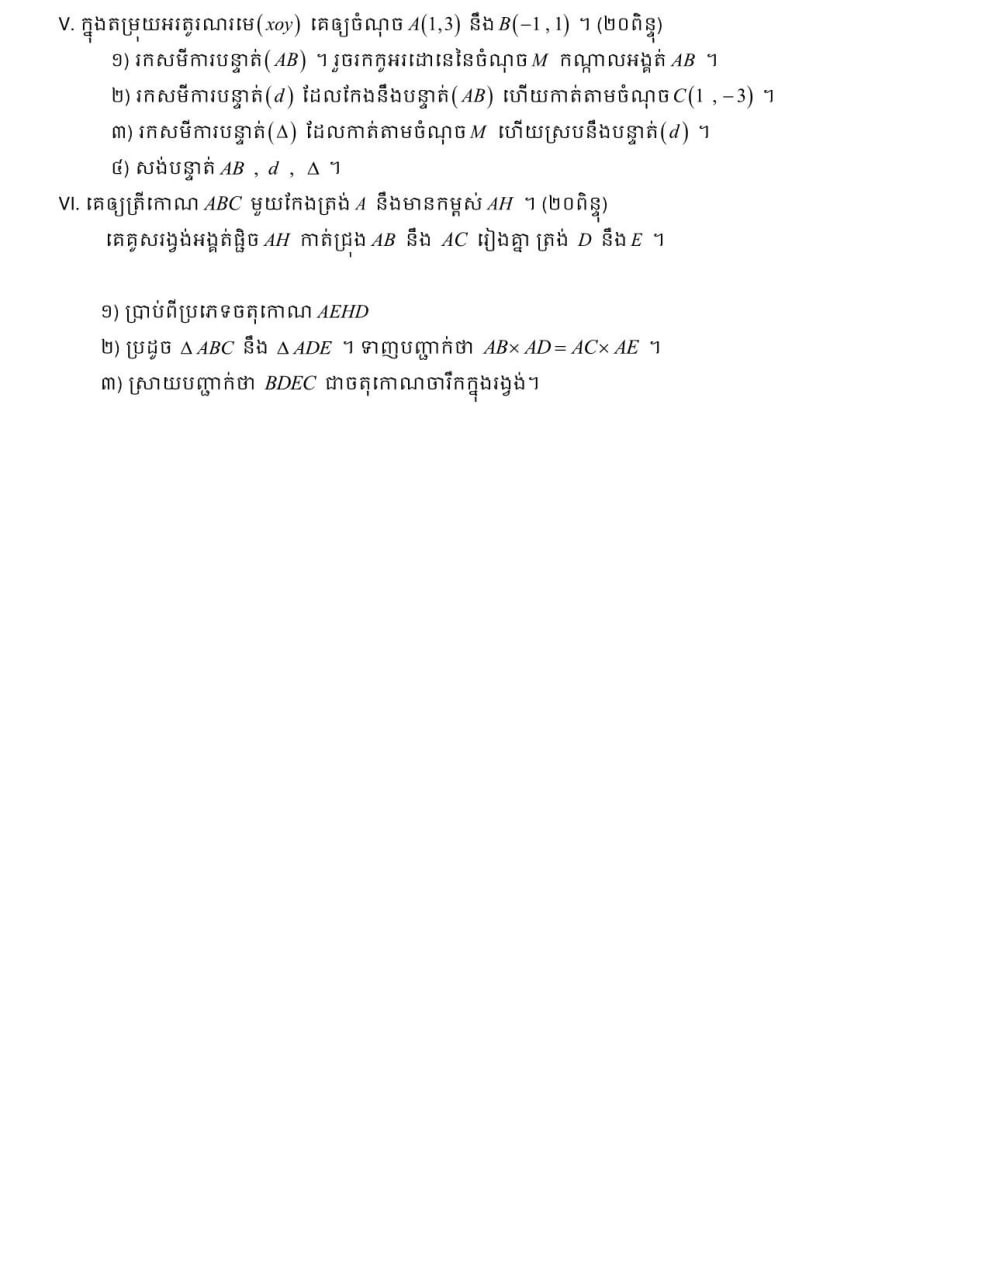 IMG_20210914_130558_468